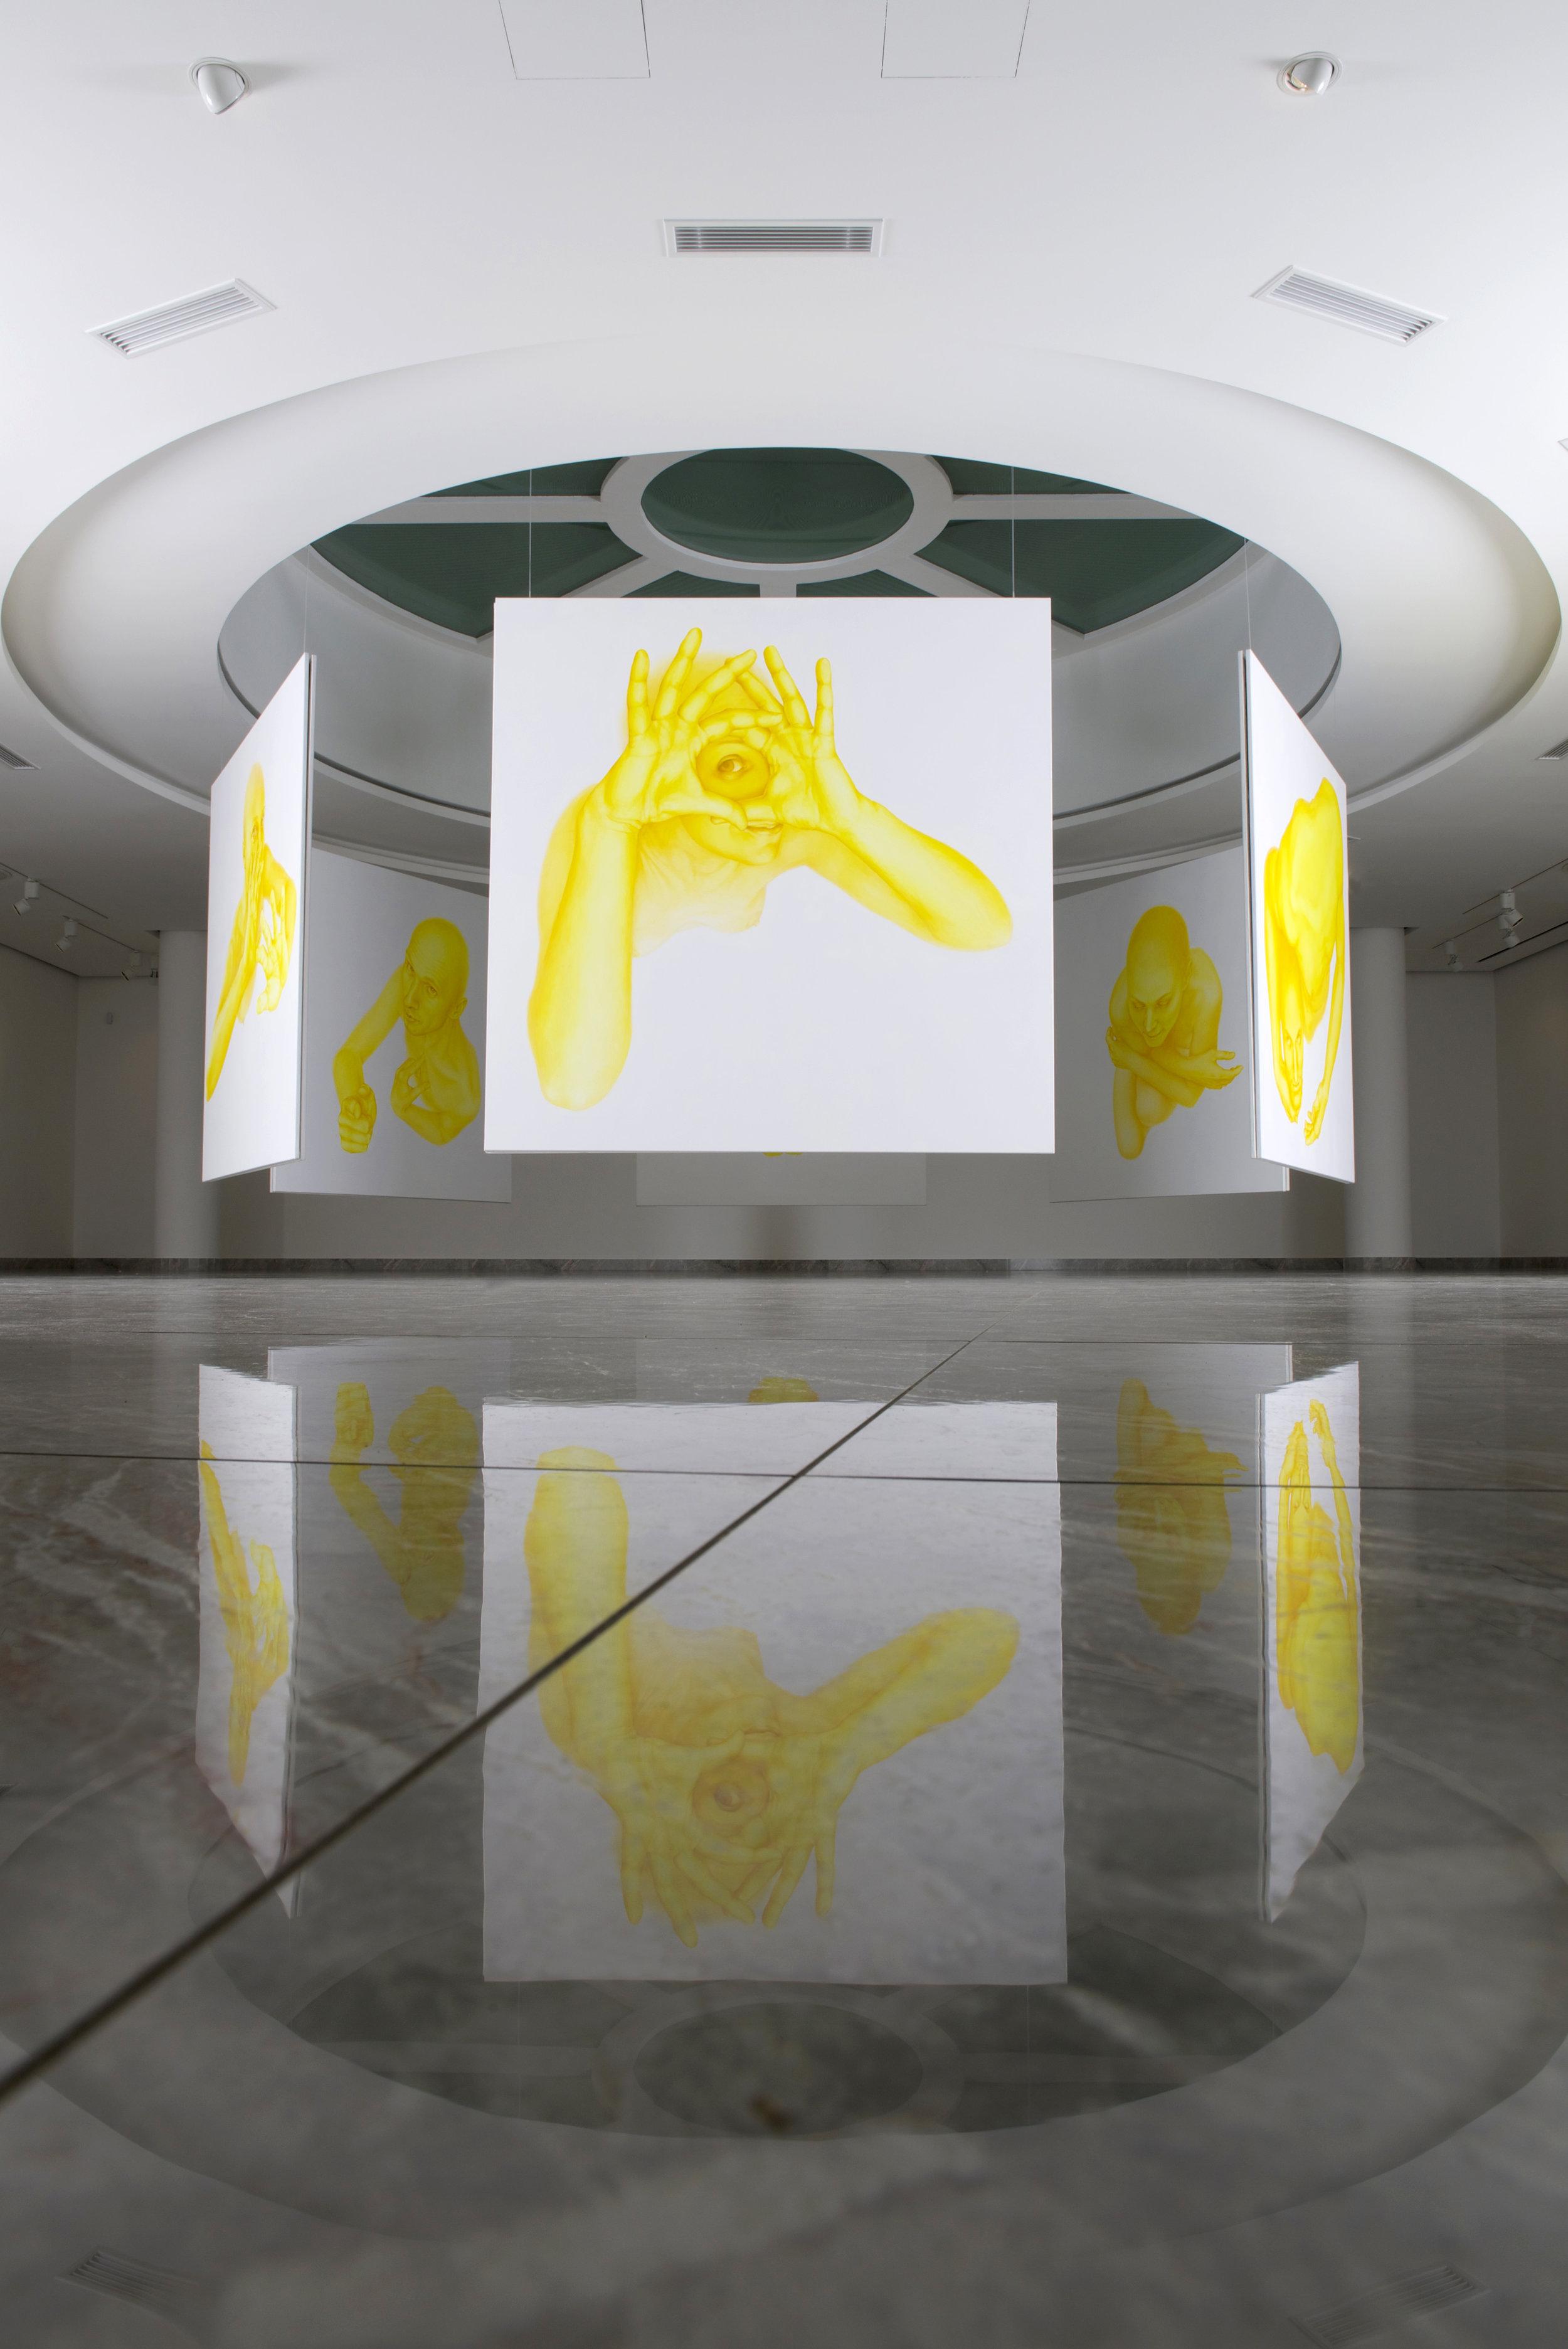 Rotunda, 2016, spatial installation of 12 paintings, each 190 x 190 cm, Nedbalka Gallery, Bratislava, Slovakia